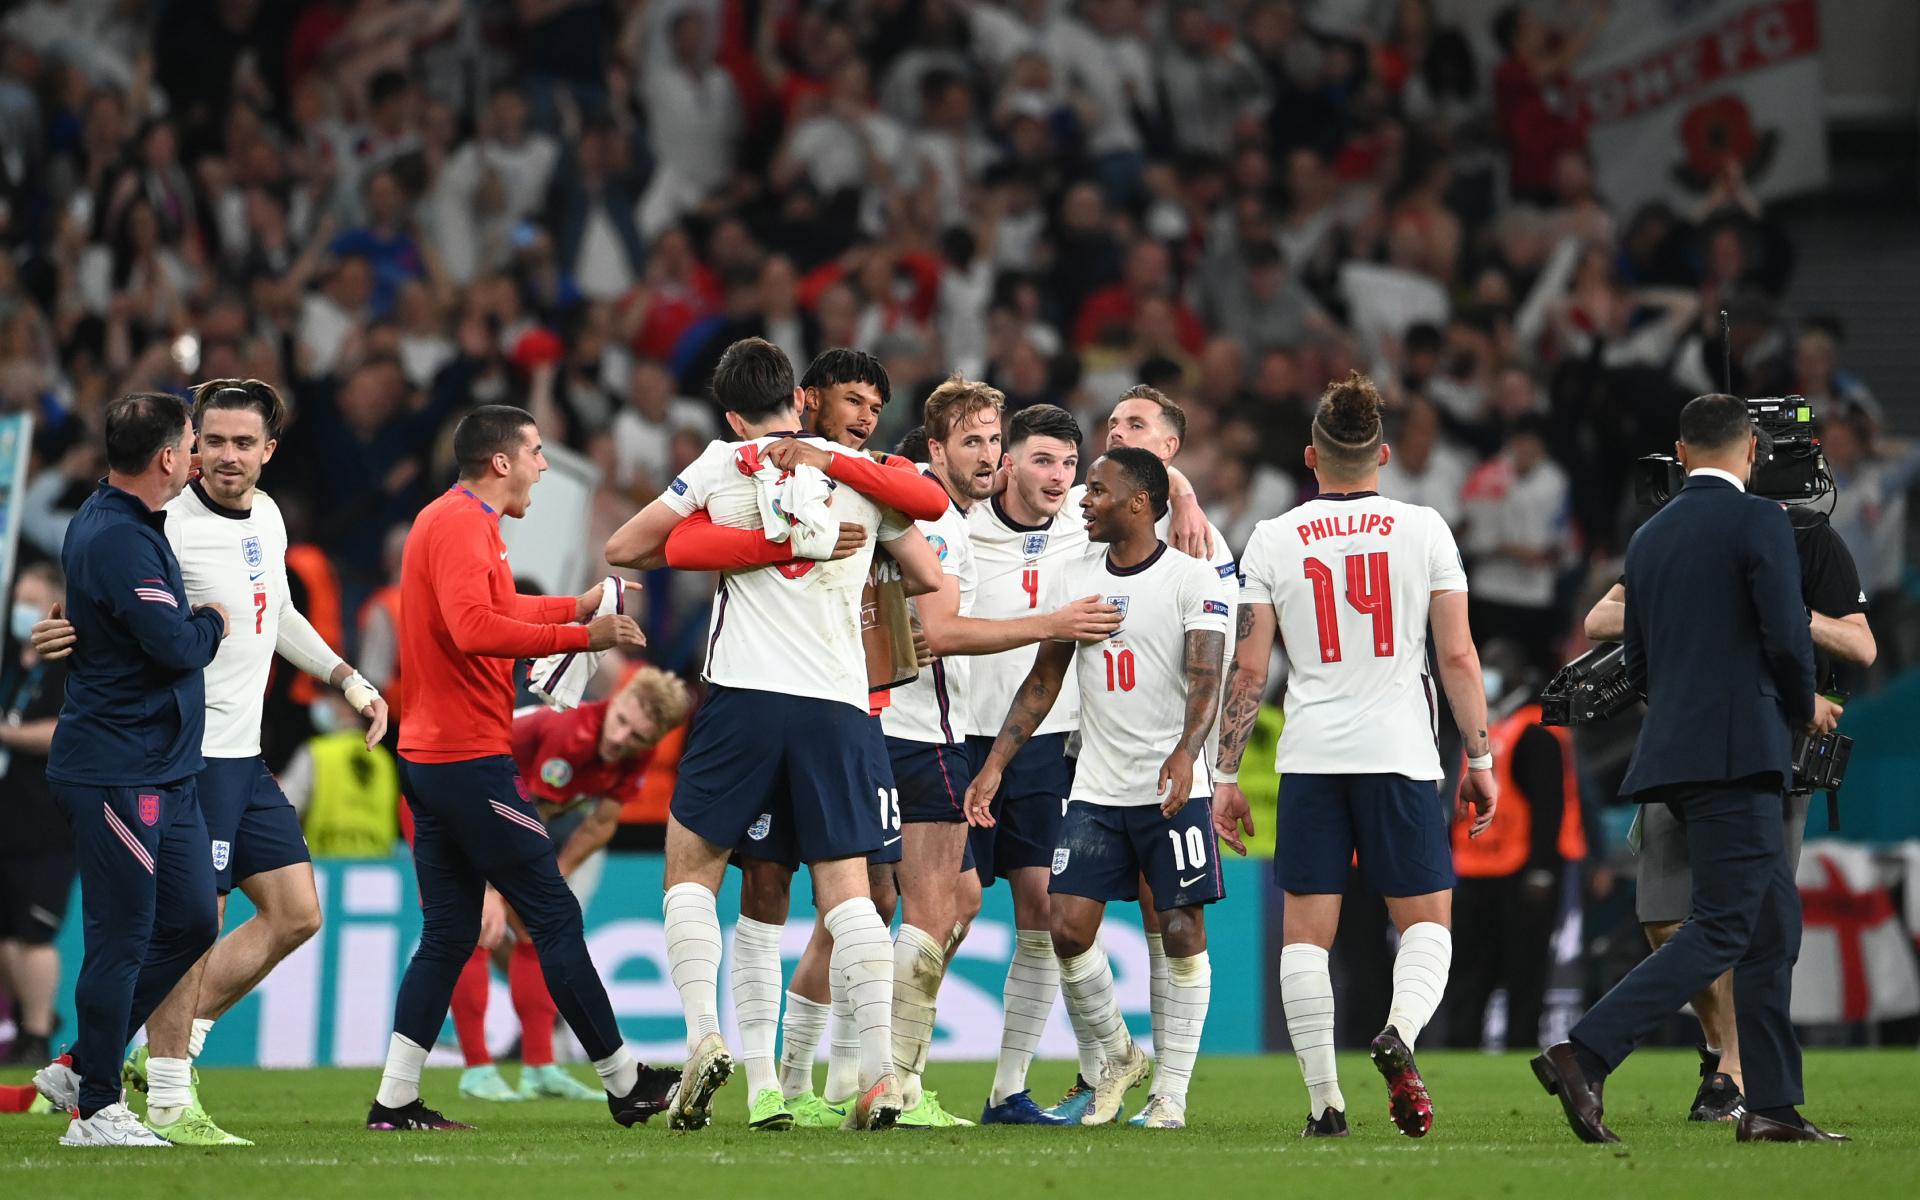 Фото: Футболисты сборной Англии празднуют выход в финал Евро-2020 (Photo by Andy Rain — Pool/Getty Images)